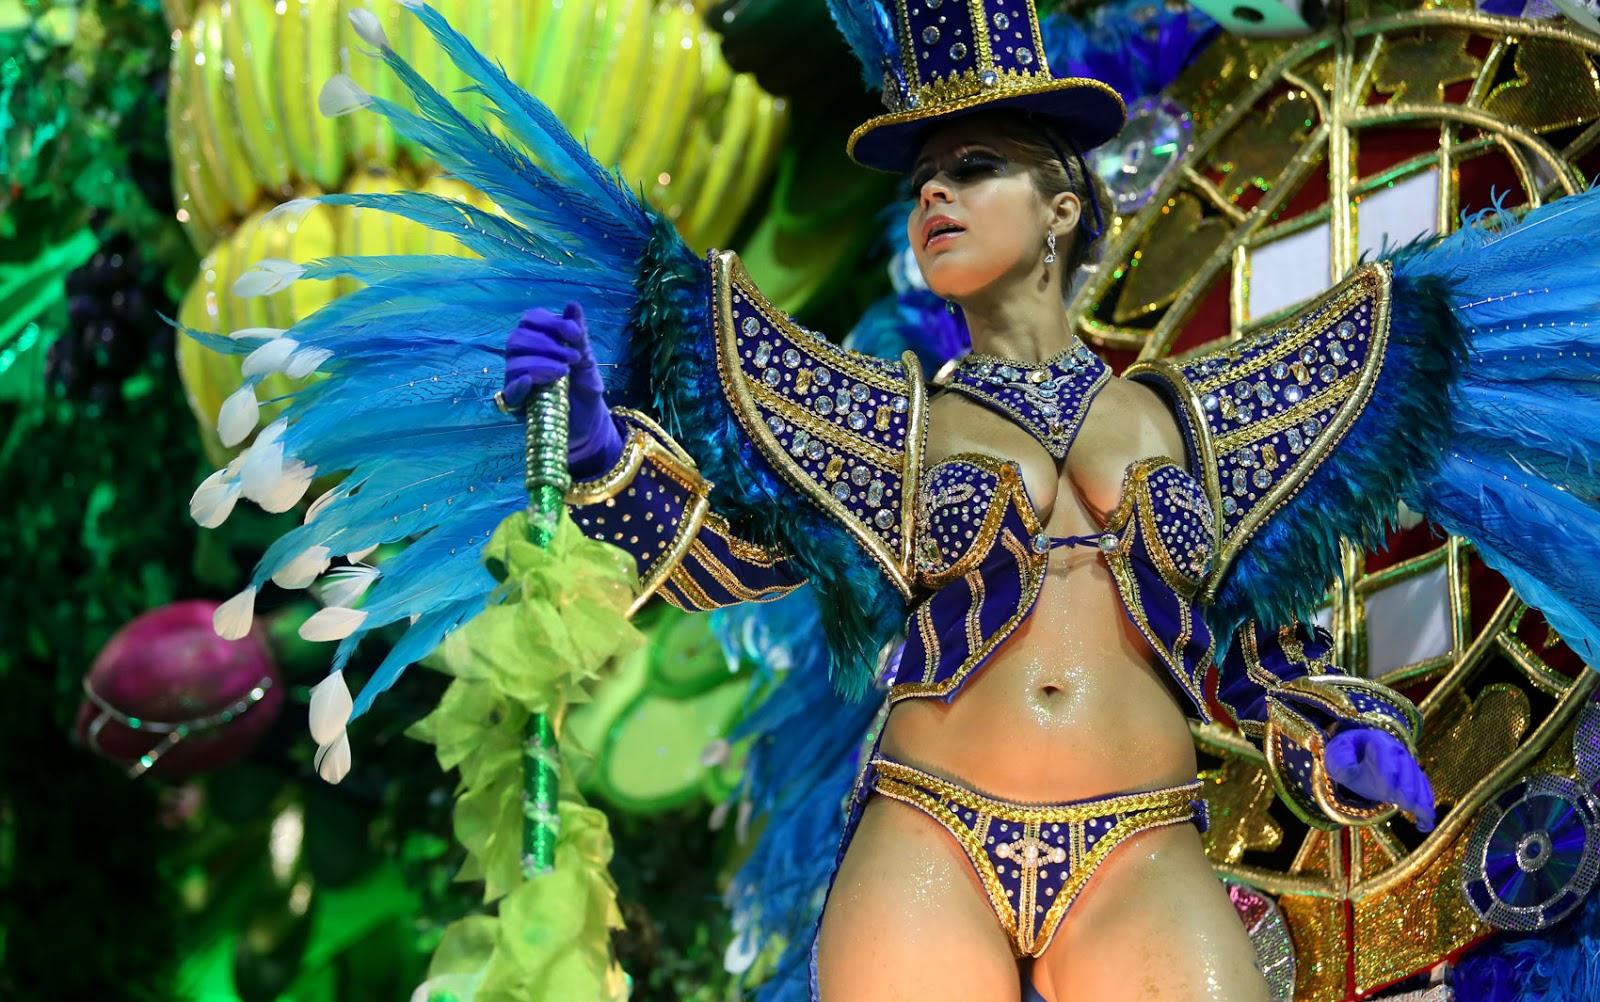 carnaval_de_rio 011.jpg